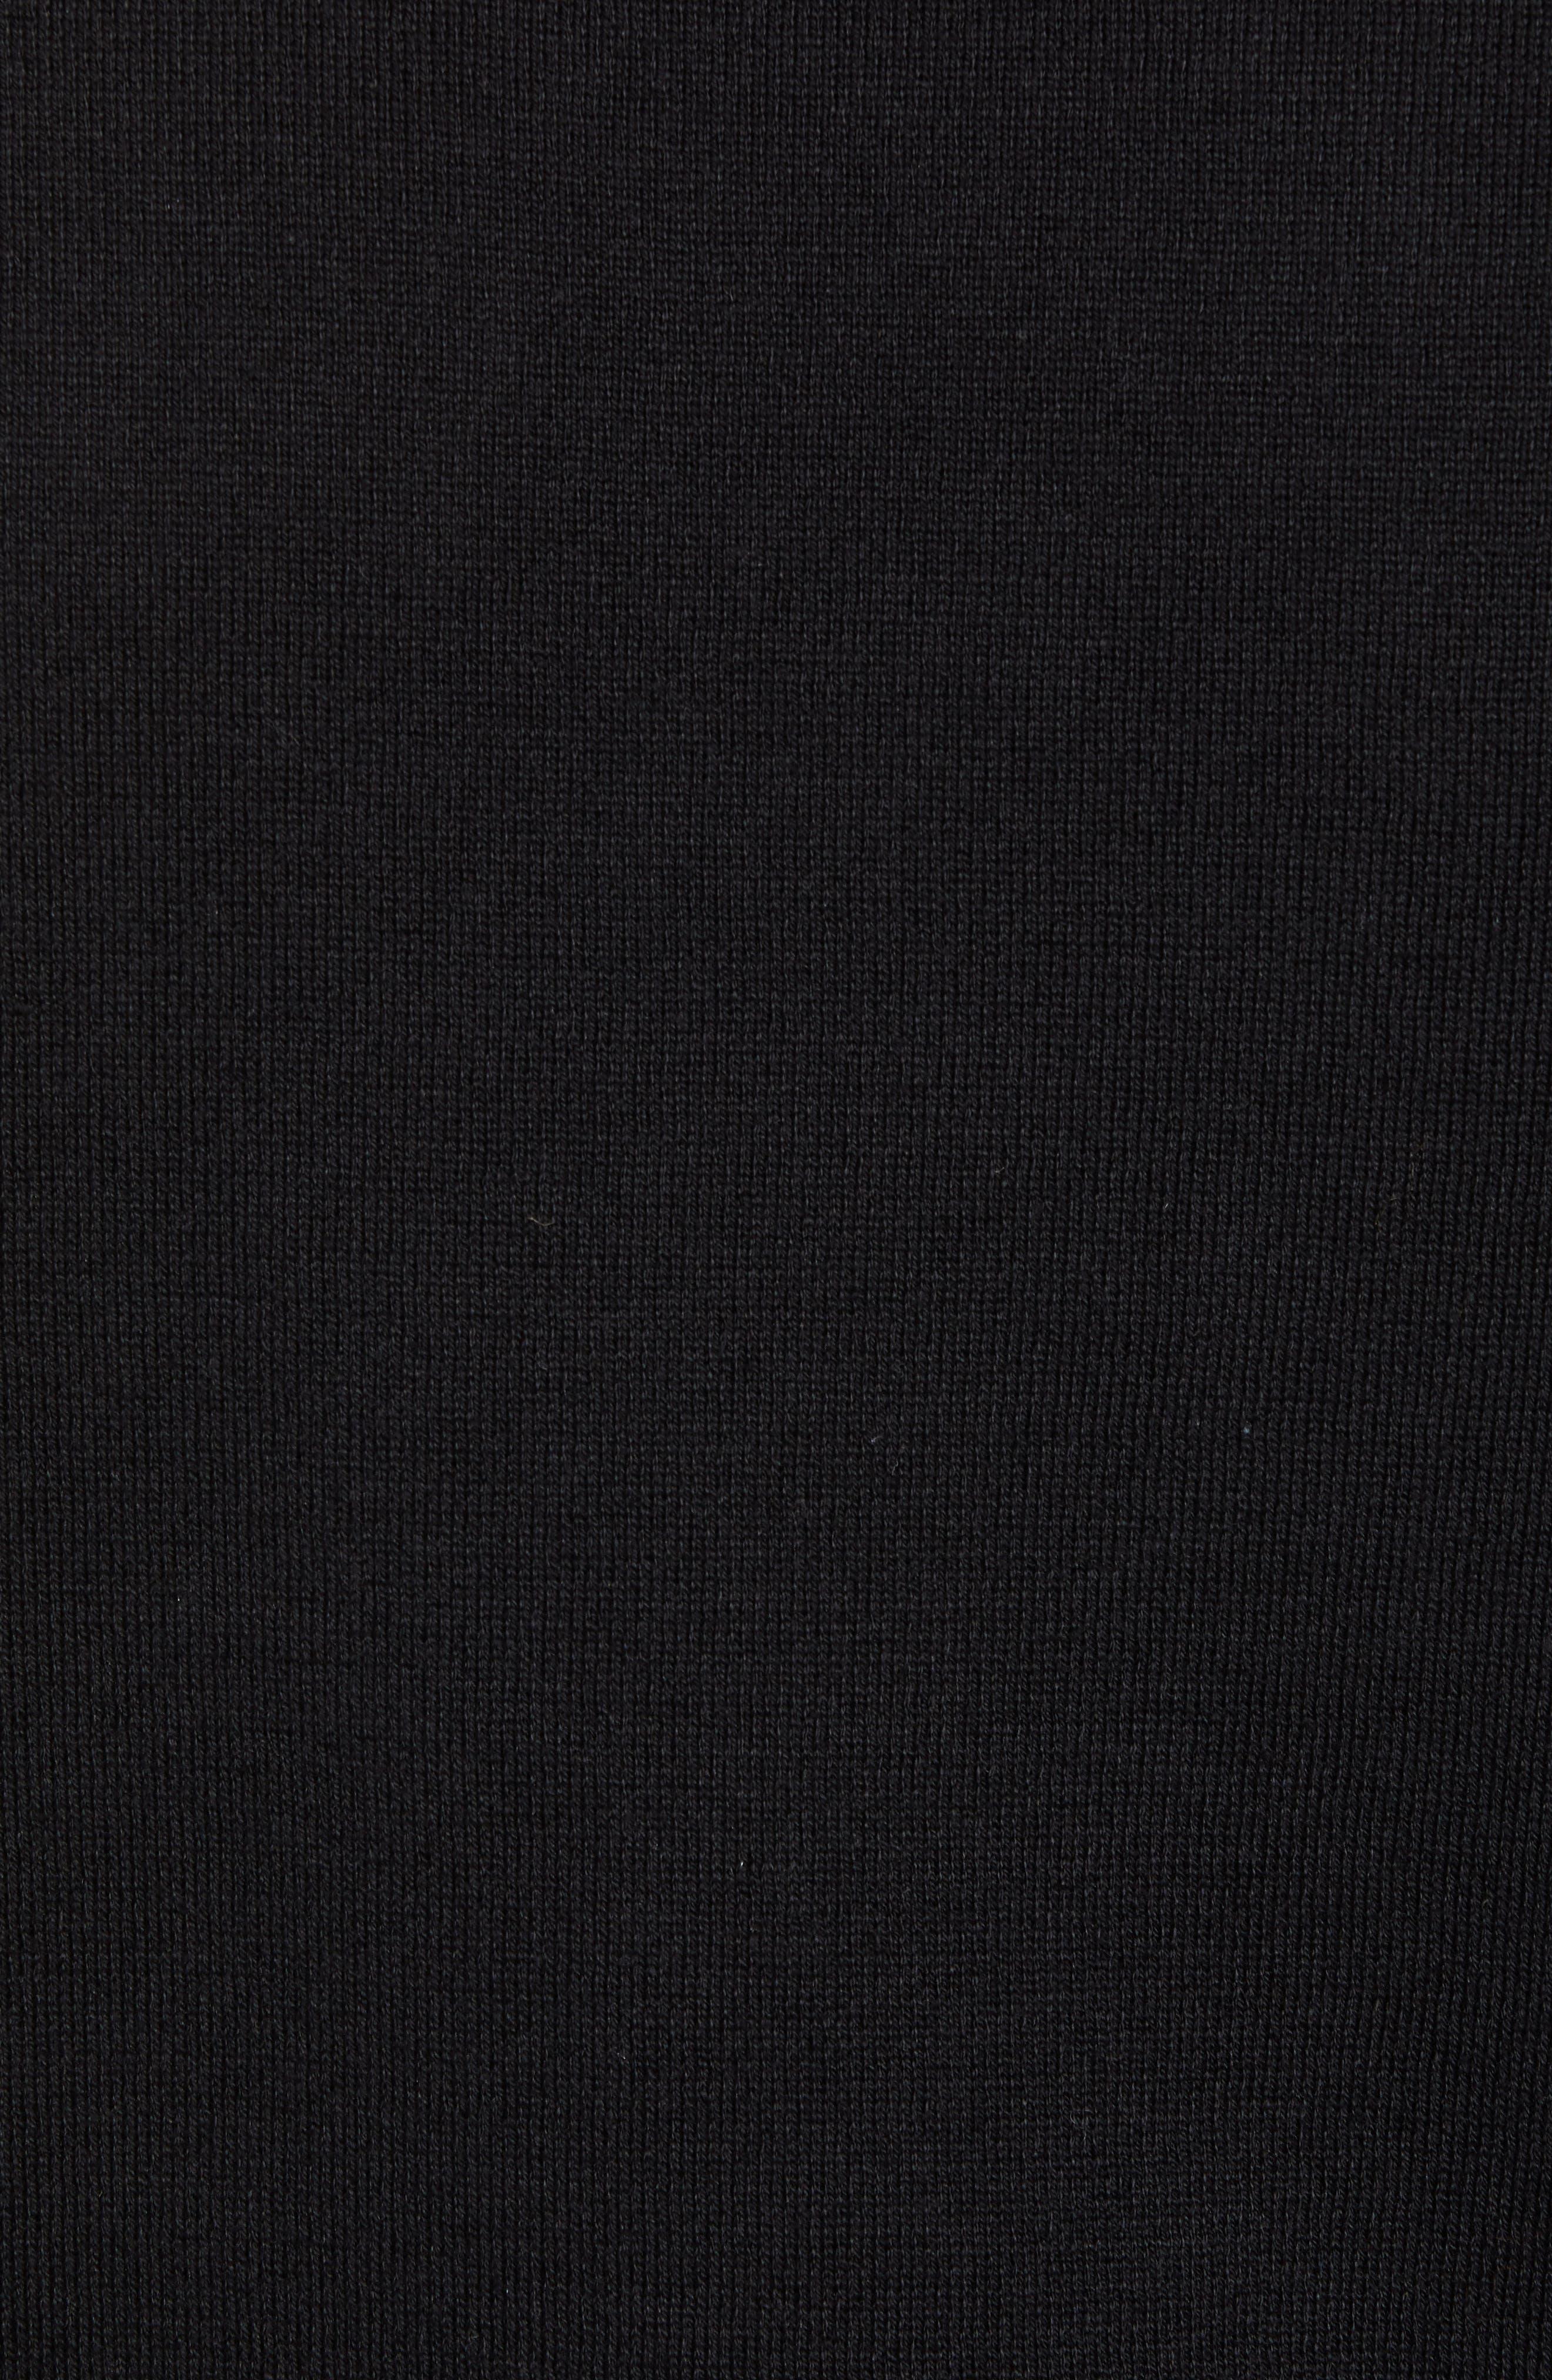 Stripe Sleeve Sweater,                             Alternate thumbnail 5, color,                             Black